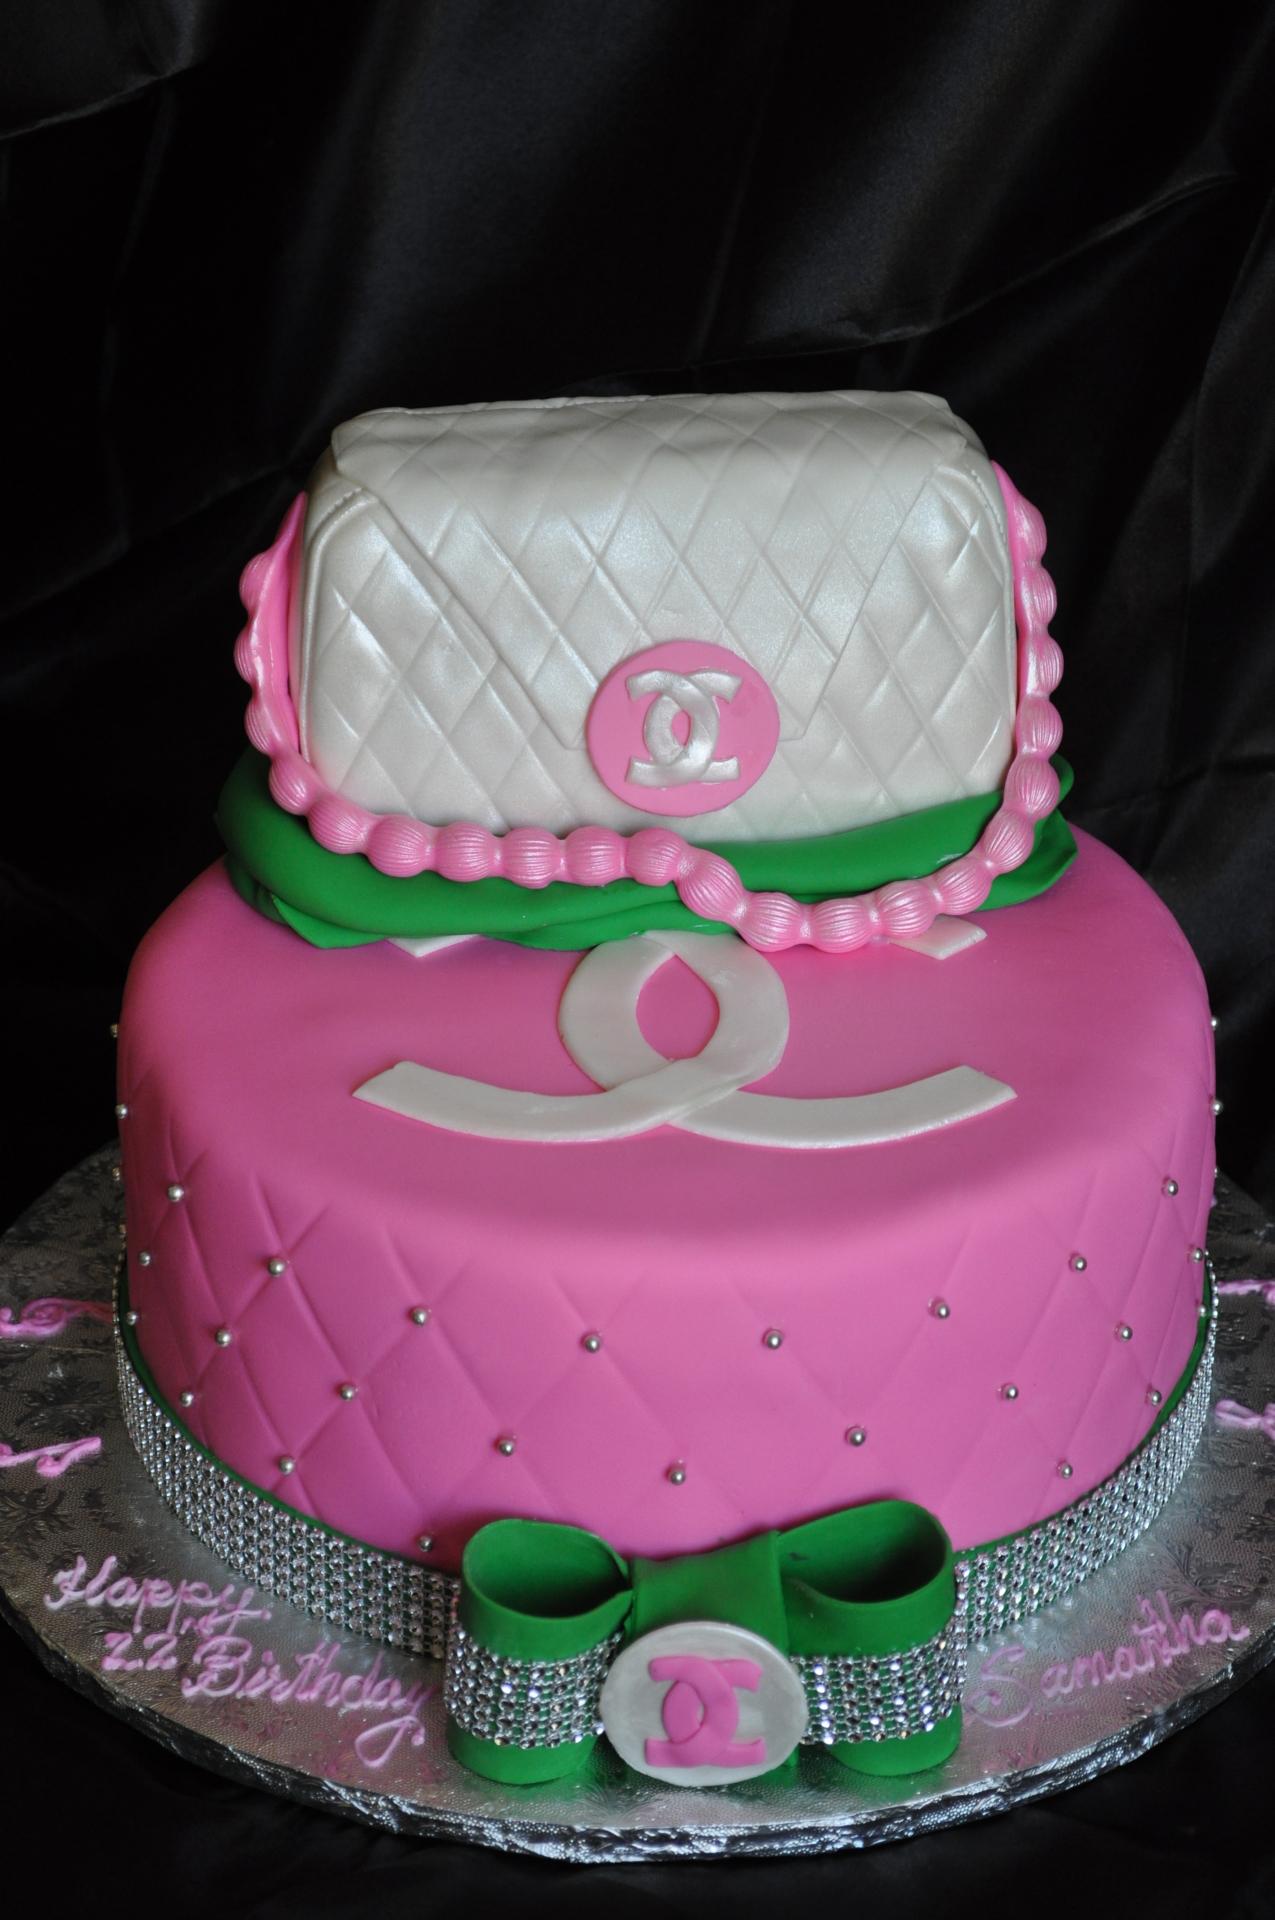 Chanel purse cake-5